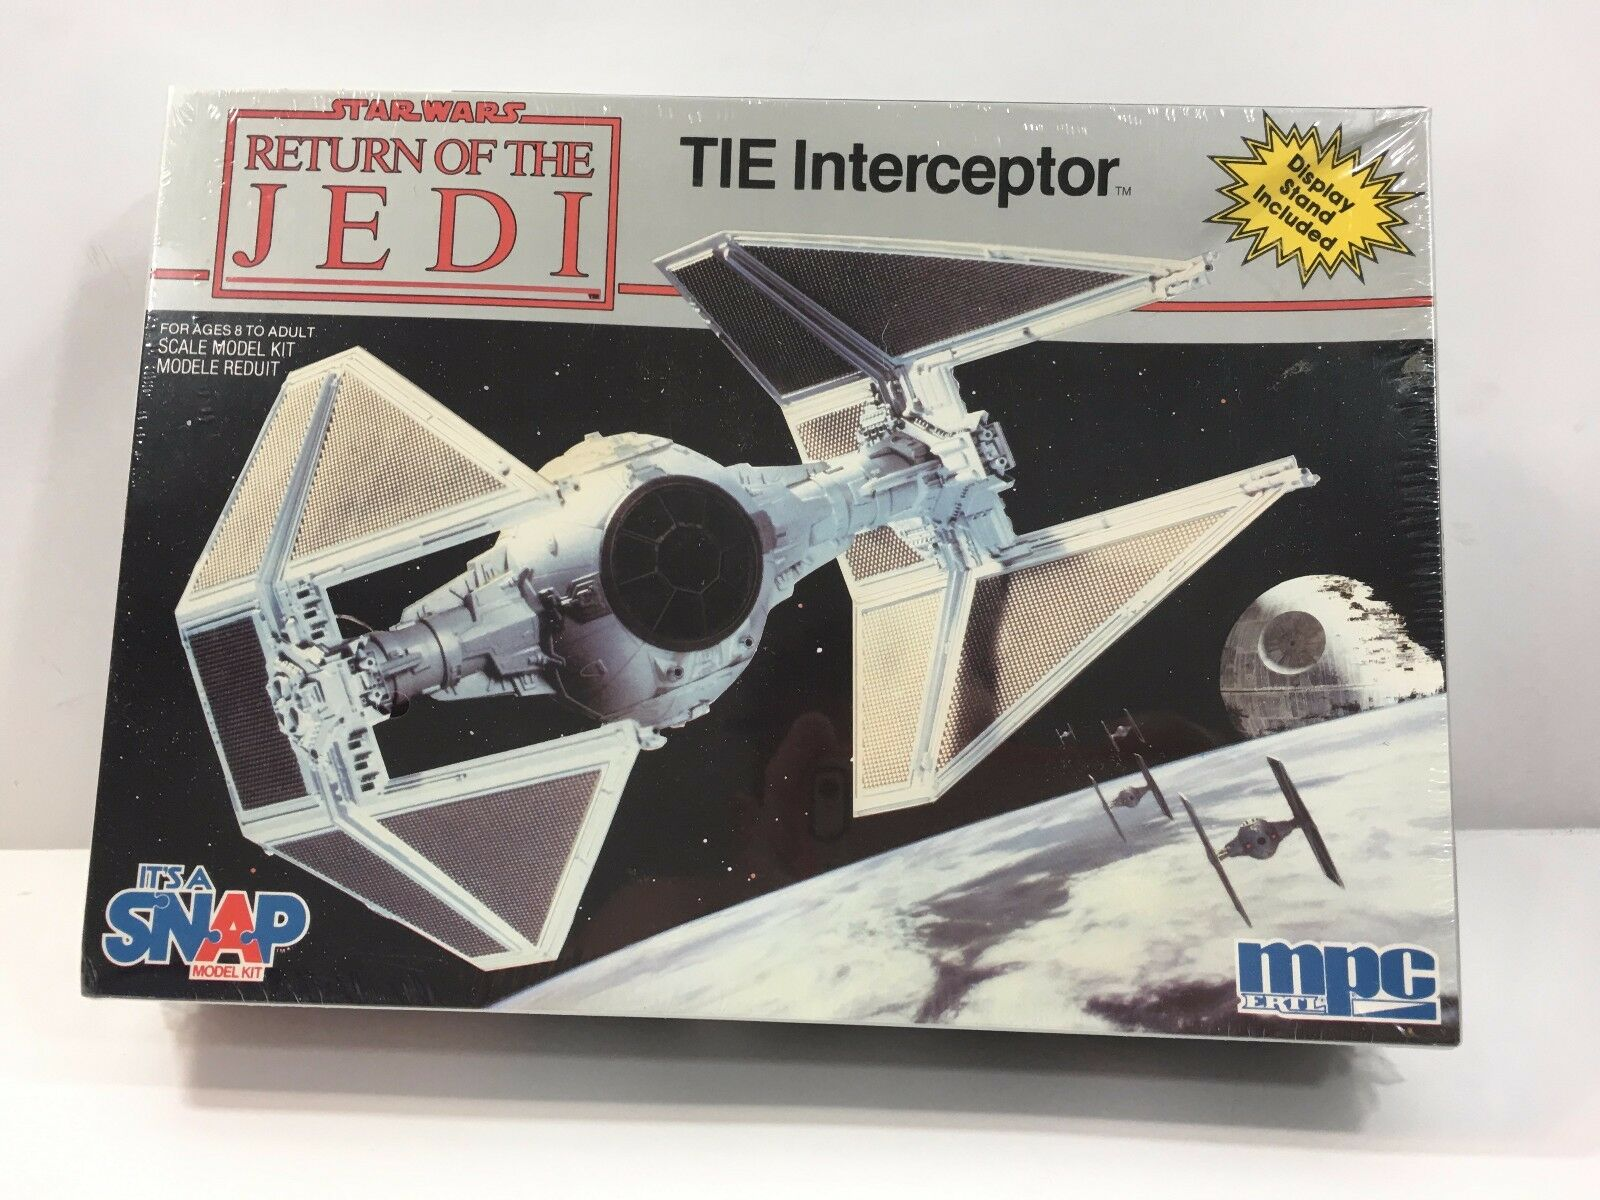 STAR WARS Return of the Jedi TIE Interceptor (1983, by MPC) w Display Stand